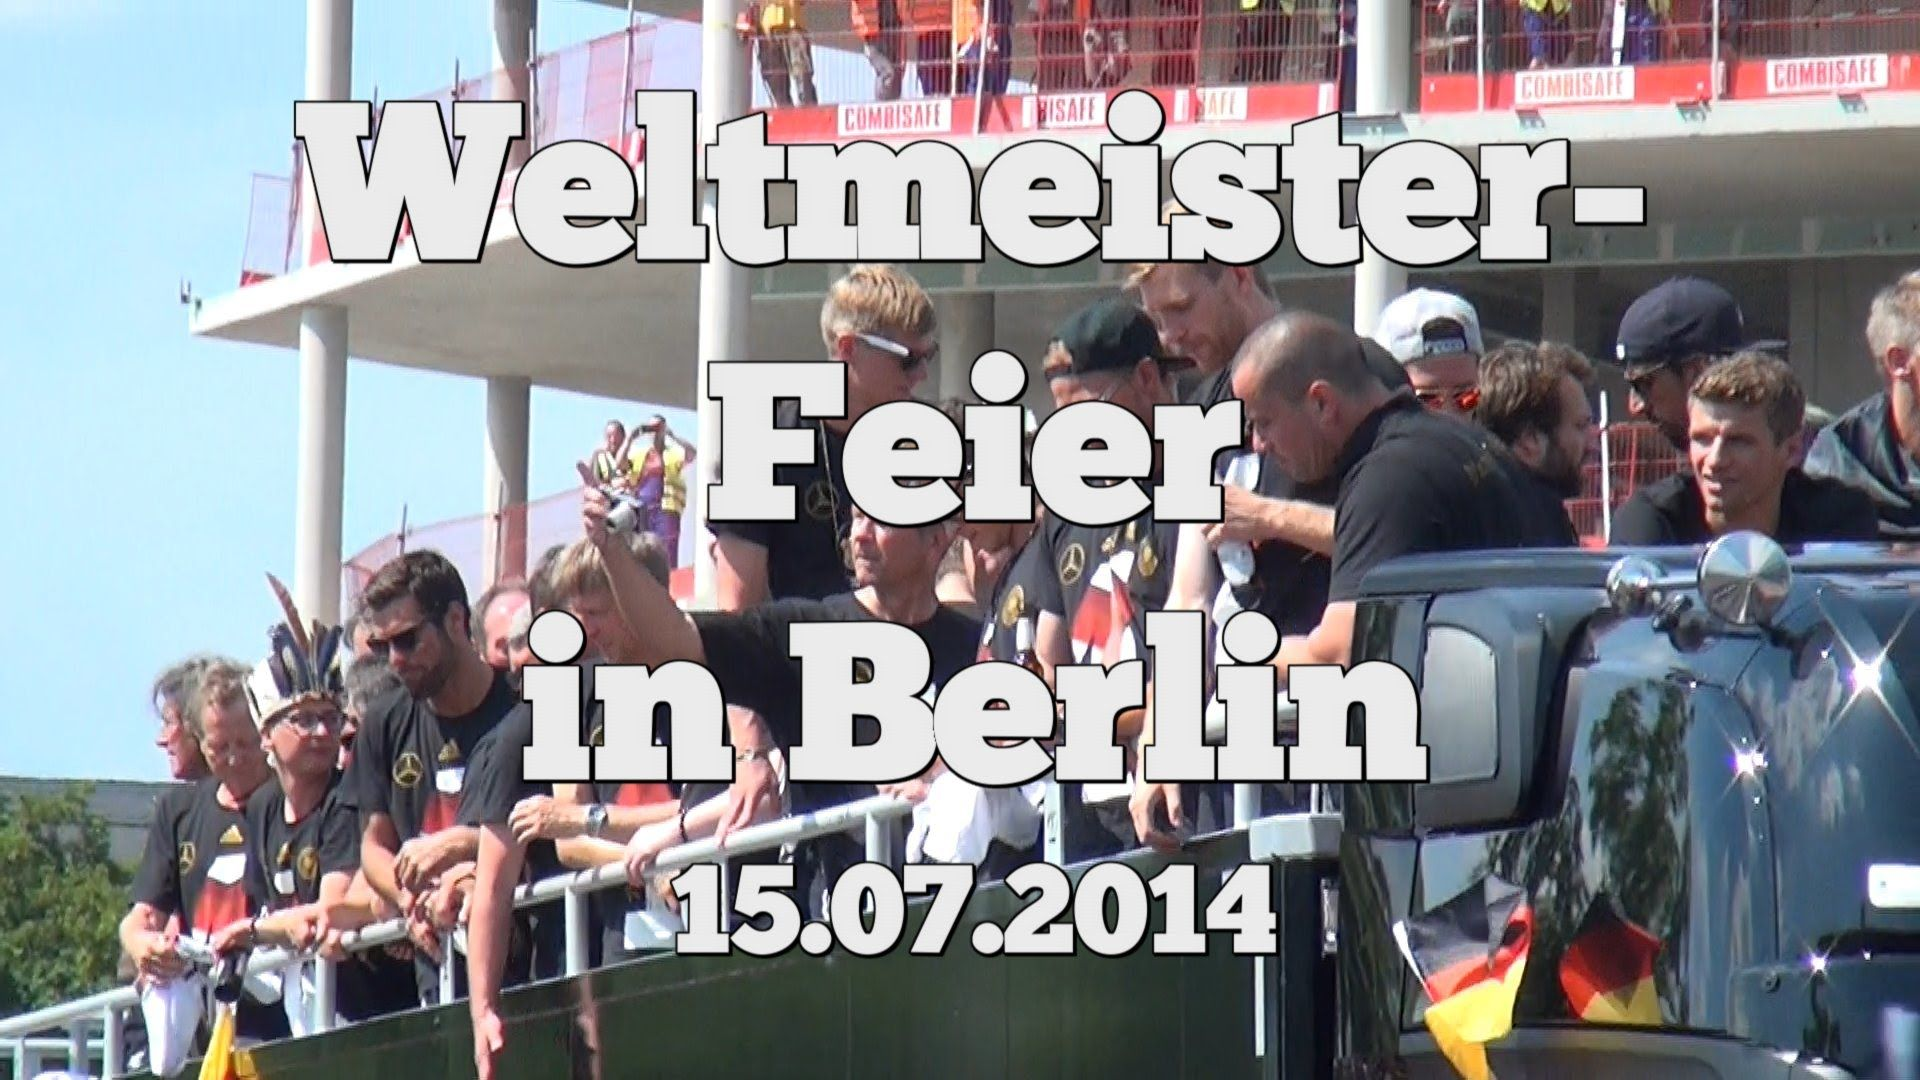 Weltmeister-Siegesfeier in Berlin 15.07.2014 aus Fan-Sicht